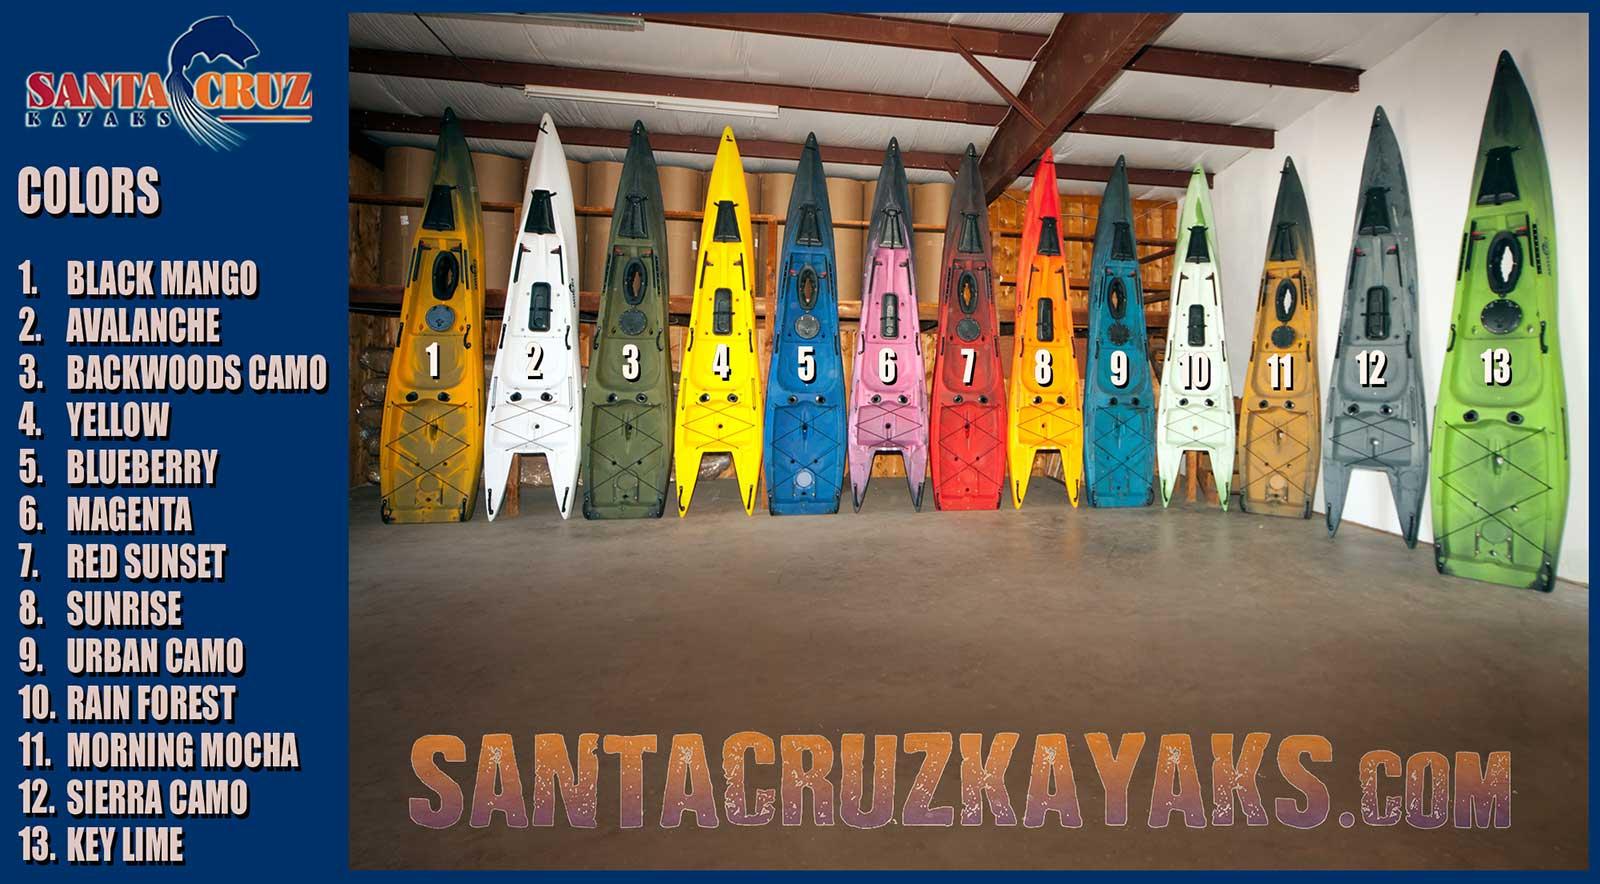 Santa Cruz Kayaks color options